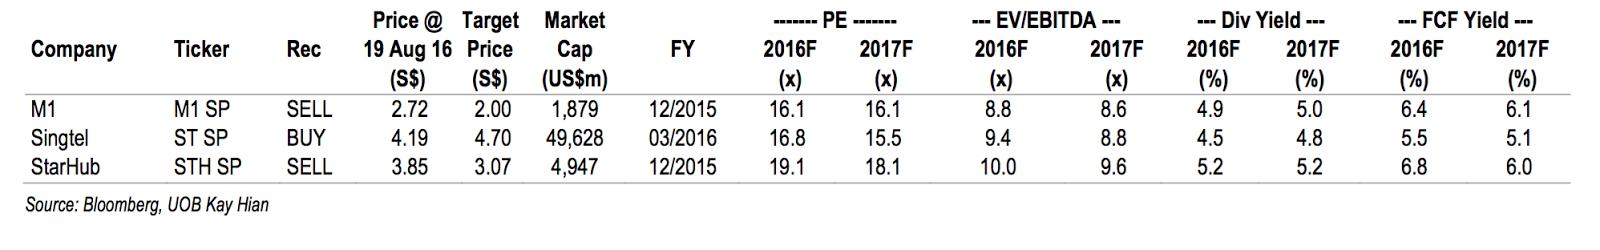 Singapore Telcos Peer Comparison by UOB Kay Hian 2016-08-22